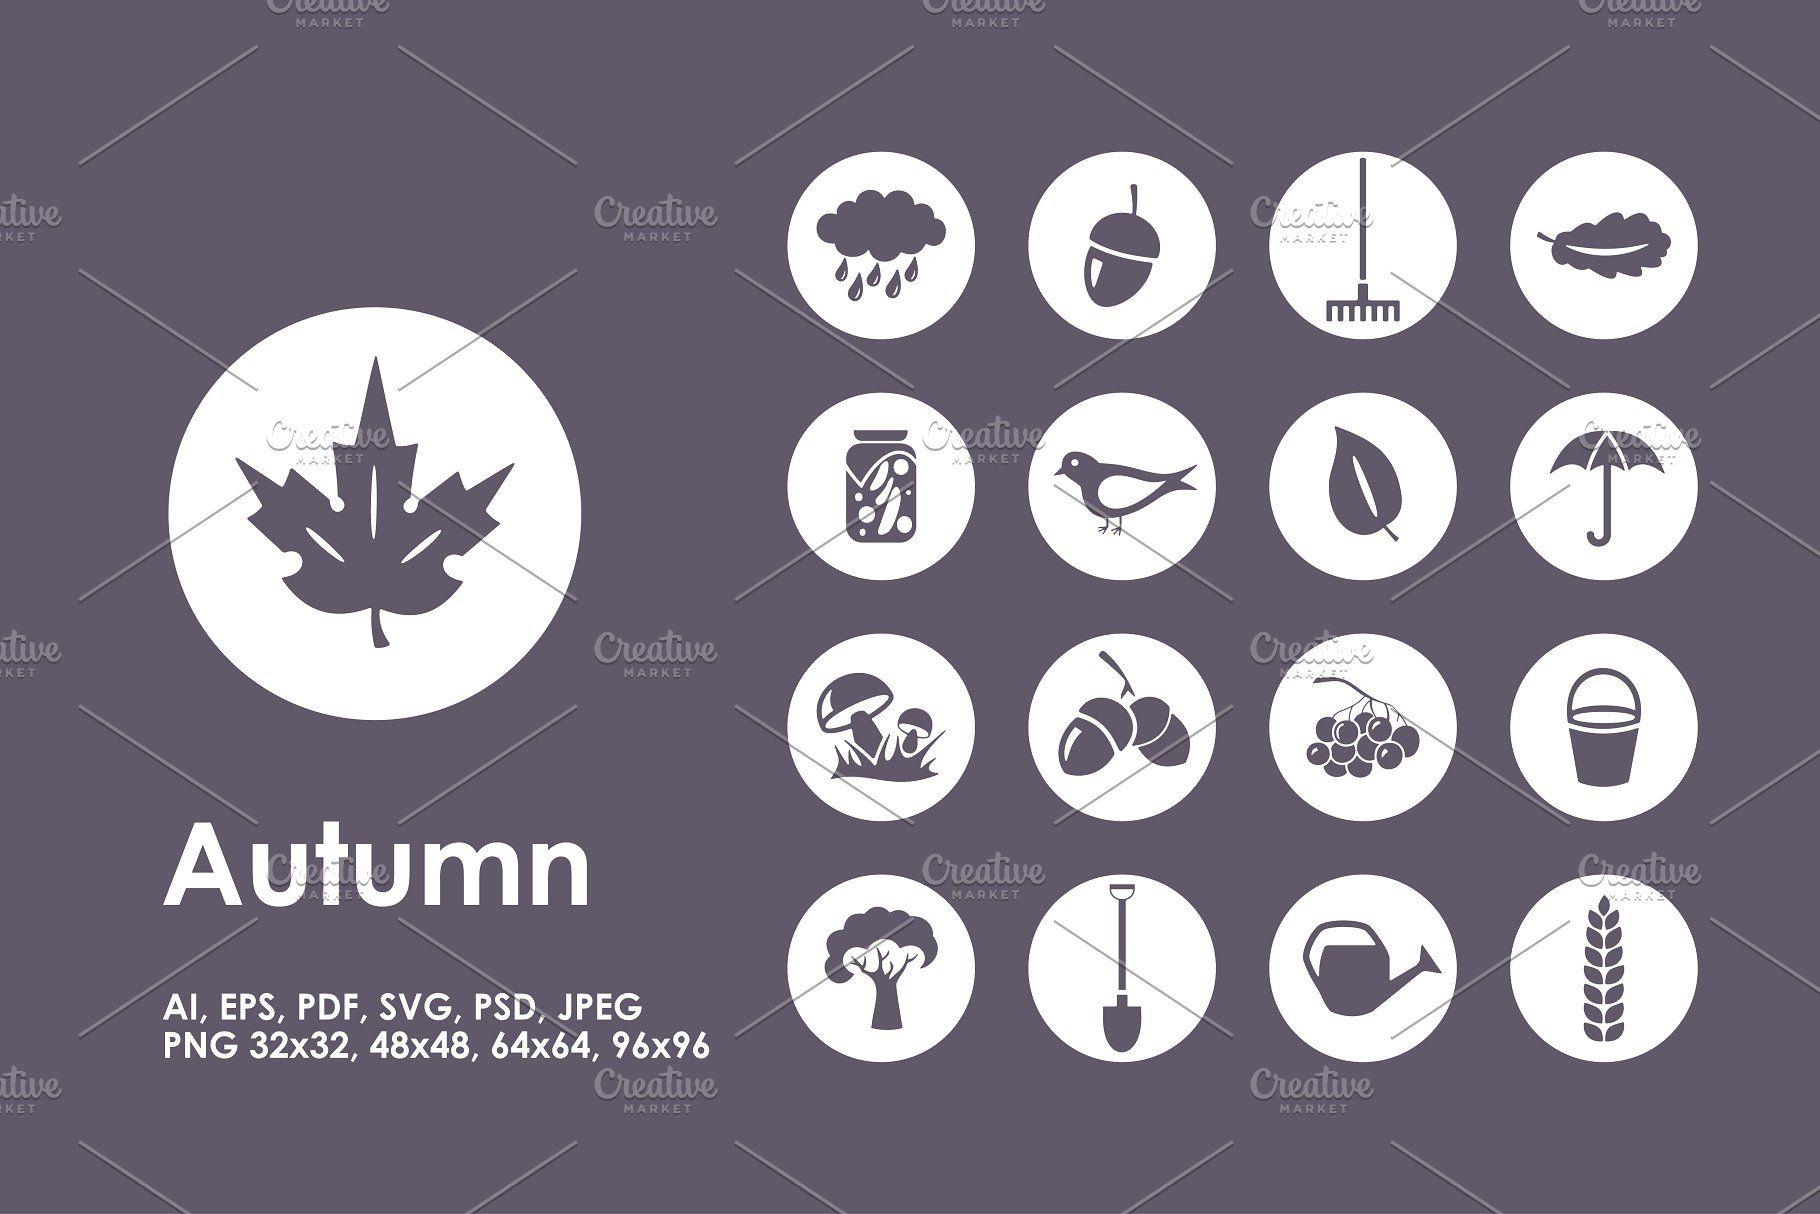 Autumn icons AutumniconsIcons Simple icon, Creative